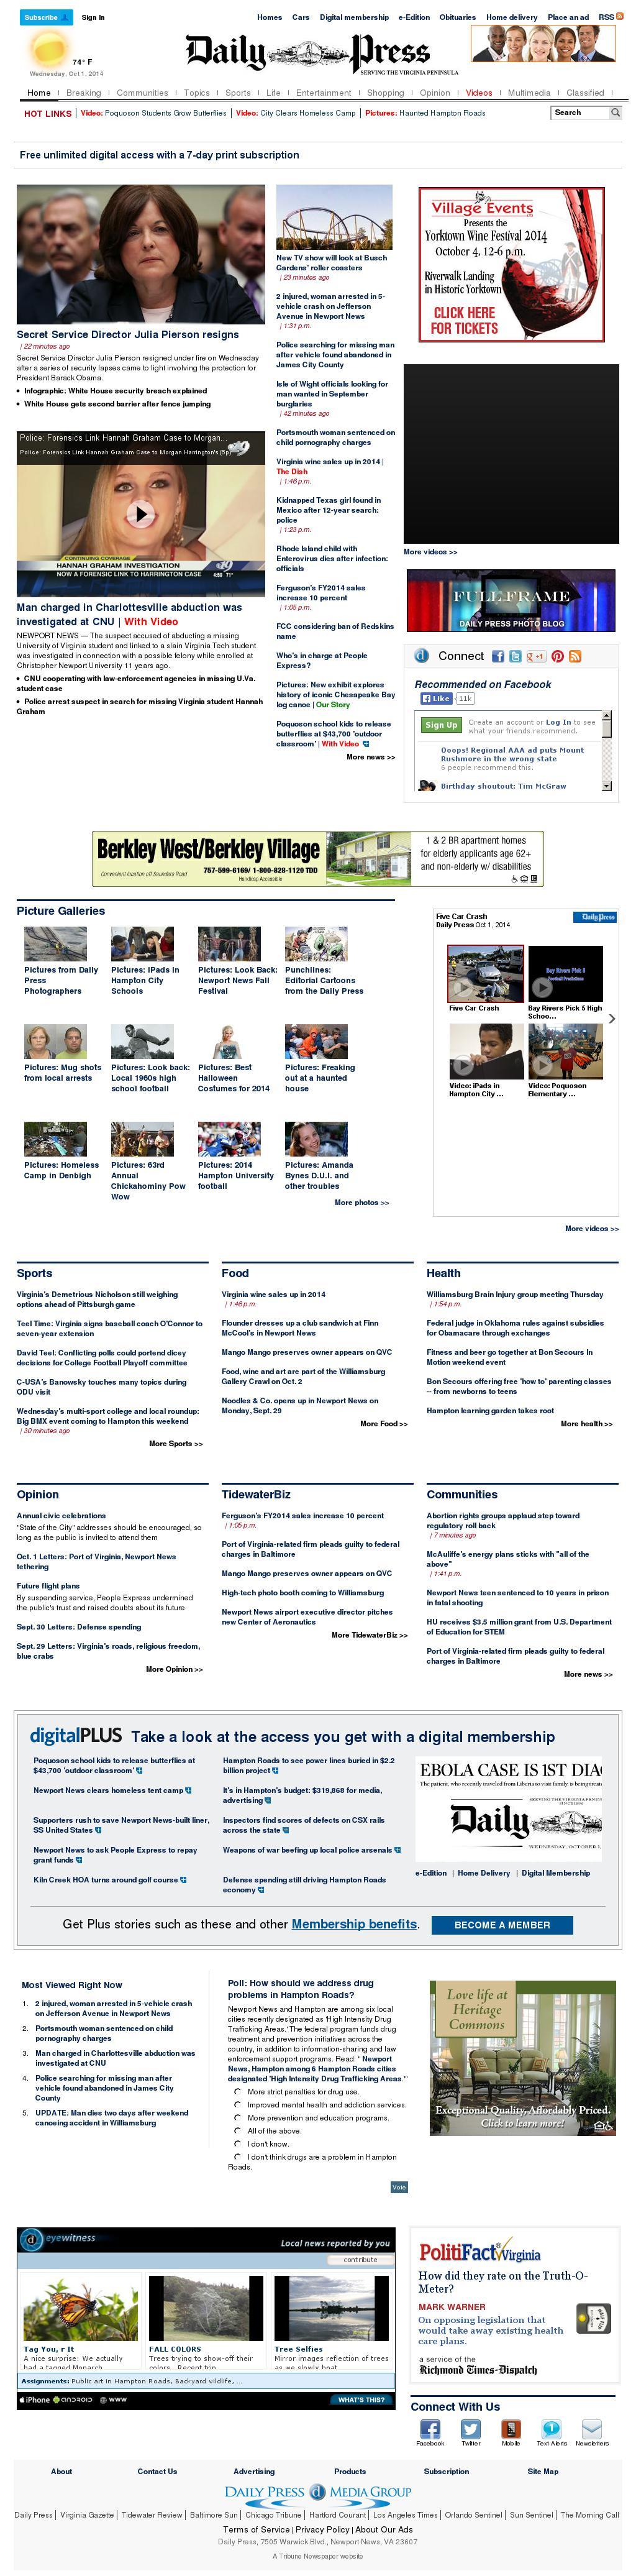 (Hampton Roads) Daily Press at Wednesday Oct. 1, 2014, 8:02 p.m. UTC